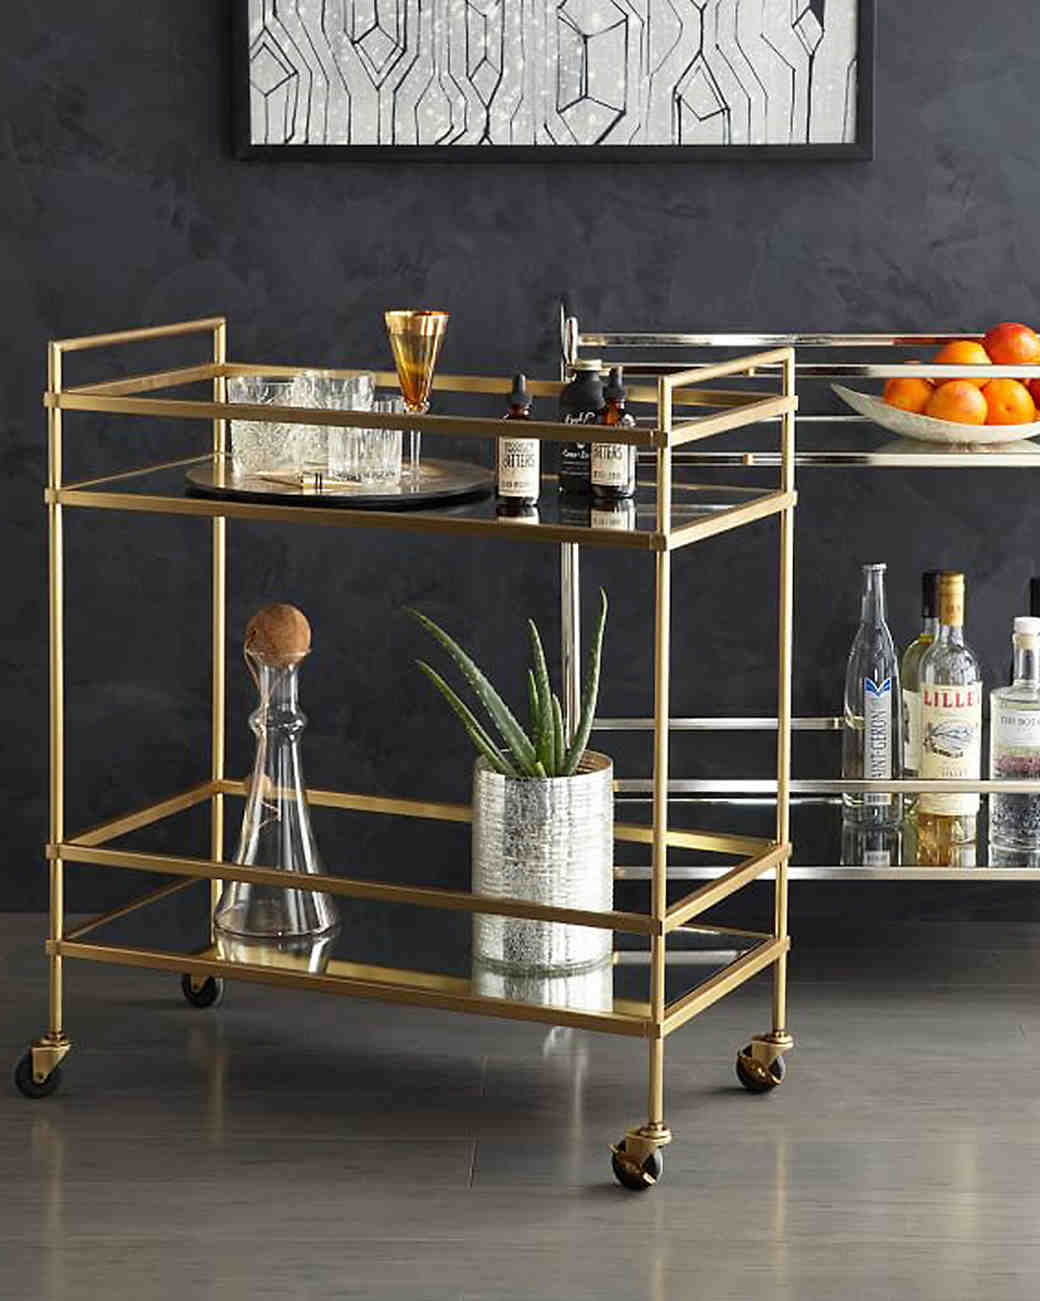 terrace-bar-cart-1215.jpg